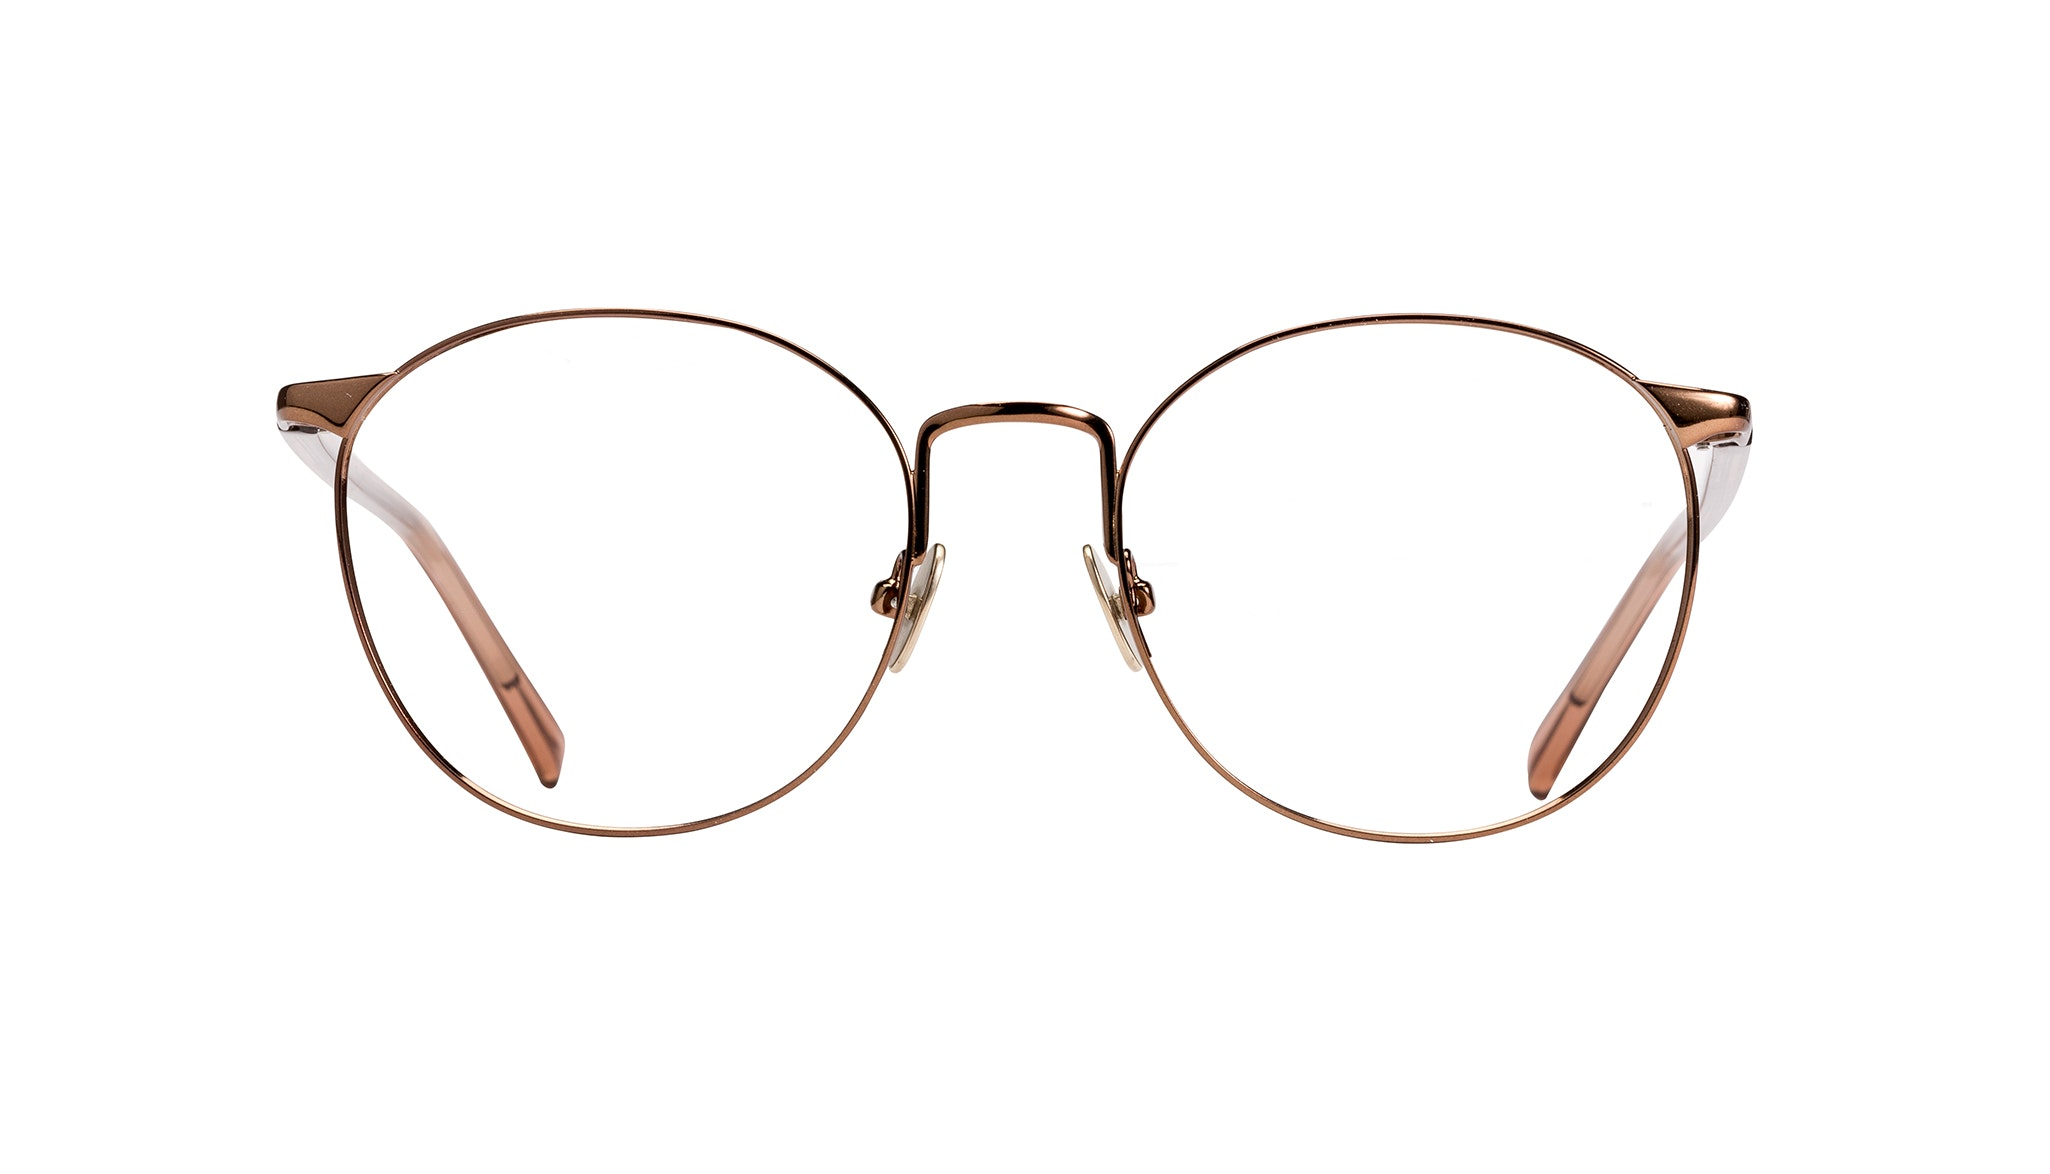 Affordable Fashion Glasses Round Eyeglasses Women Romy Crepuscule